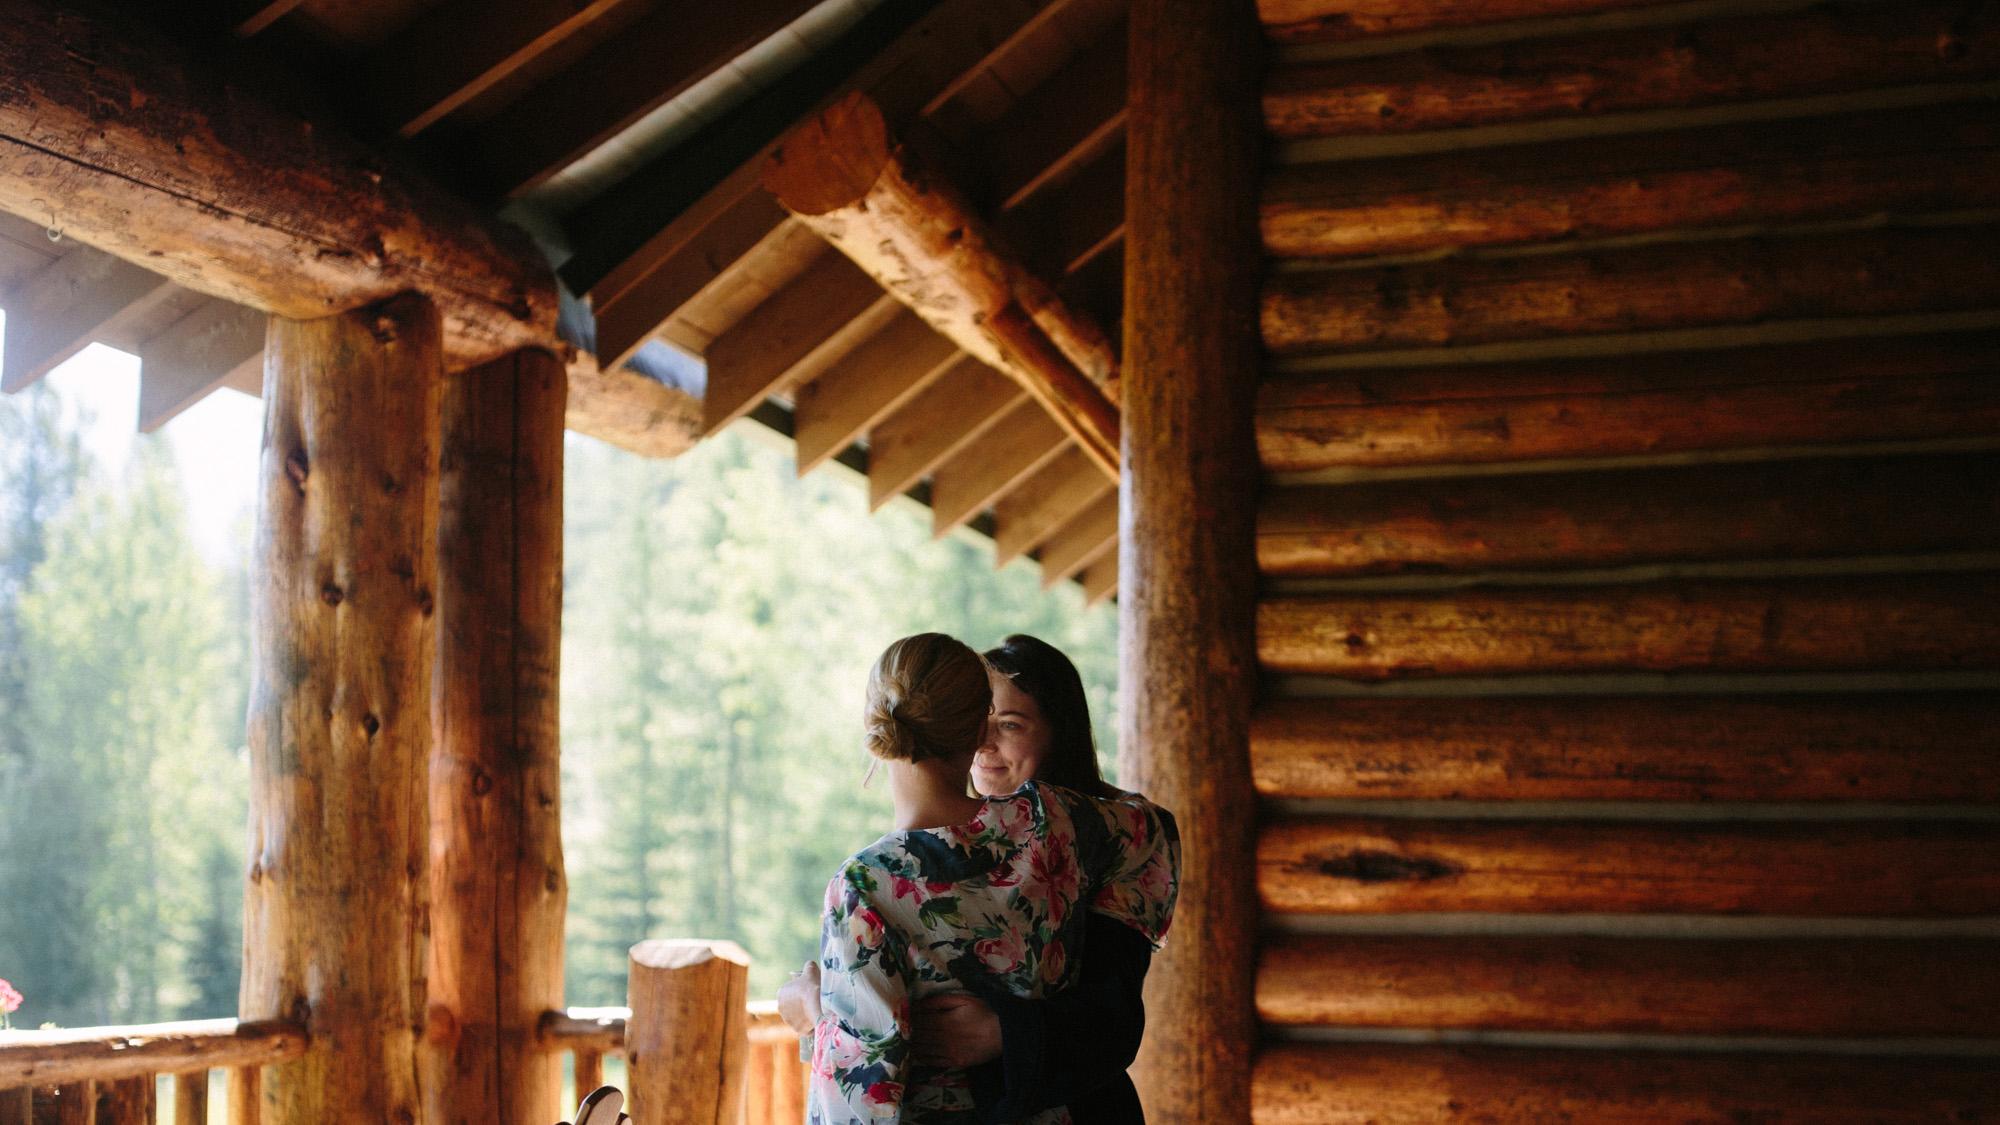 Montana_Wedding_Photos_alec_vanderboom-0042.jpg